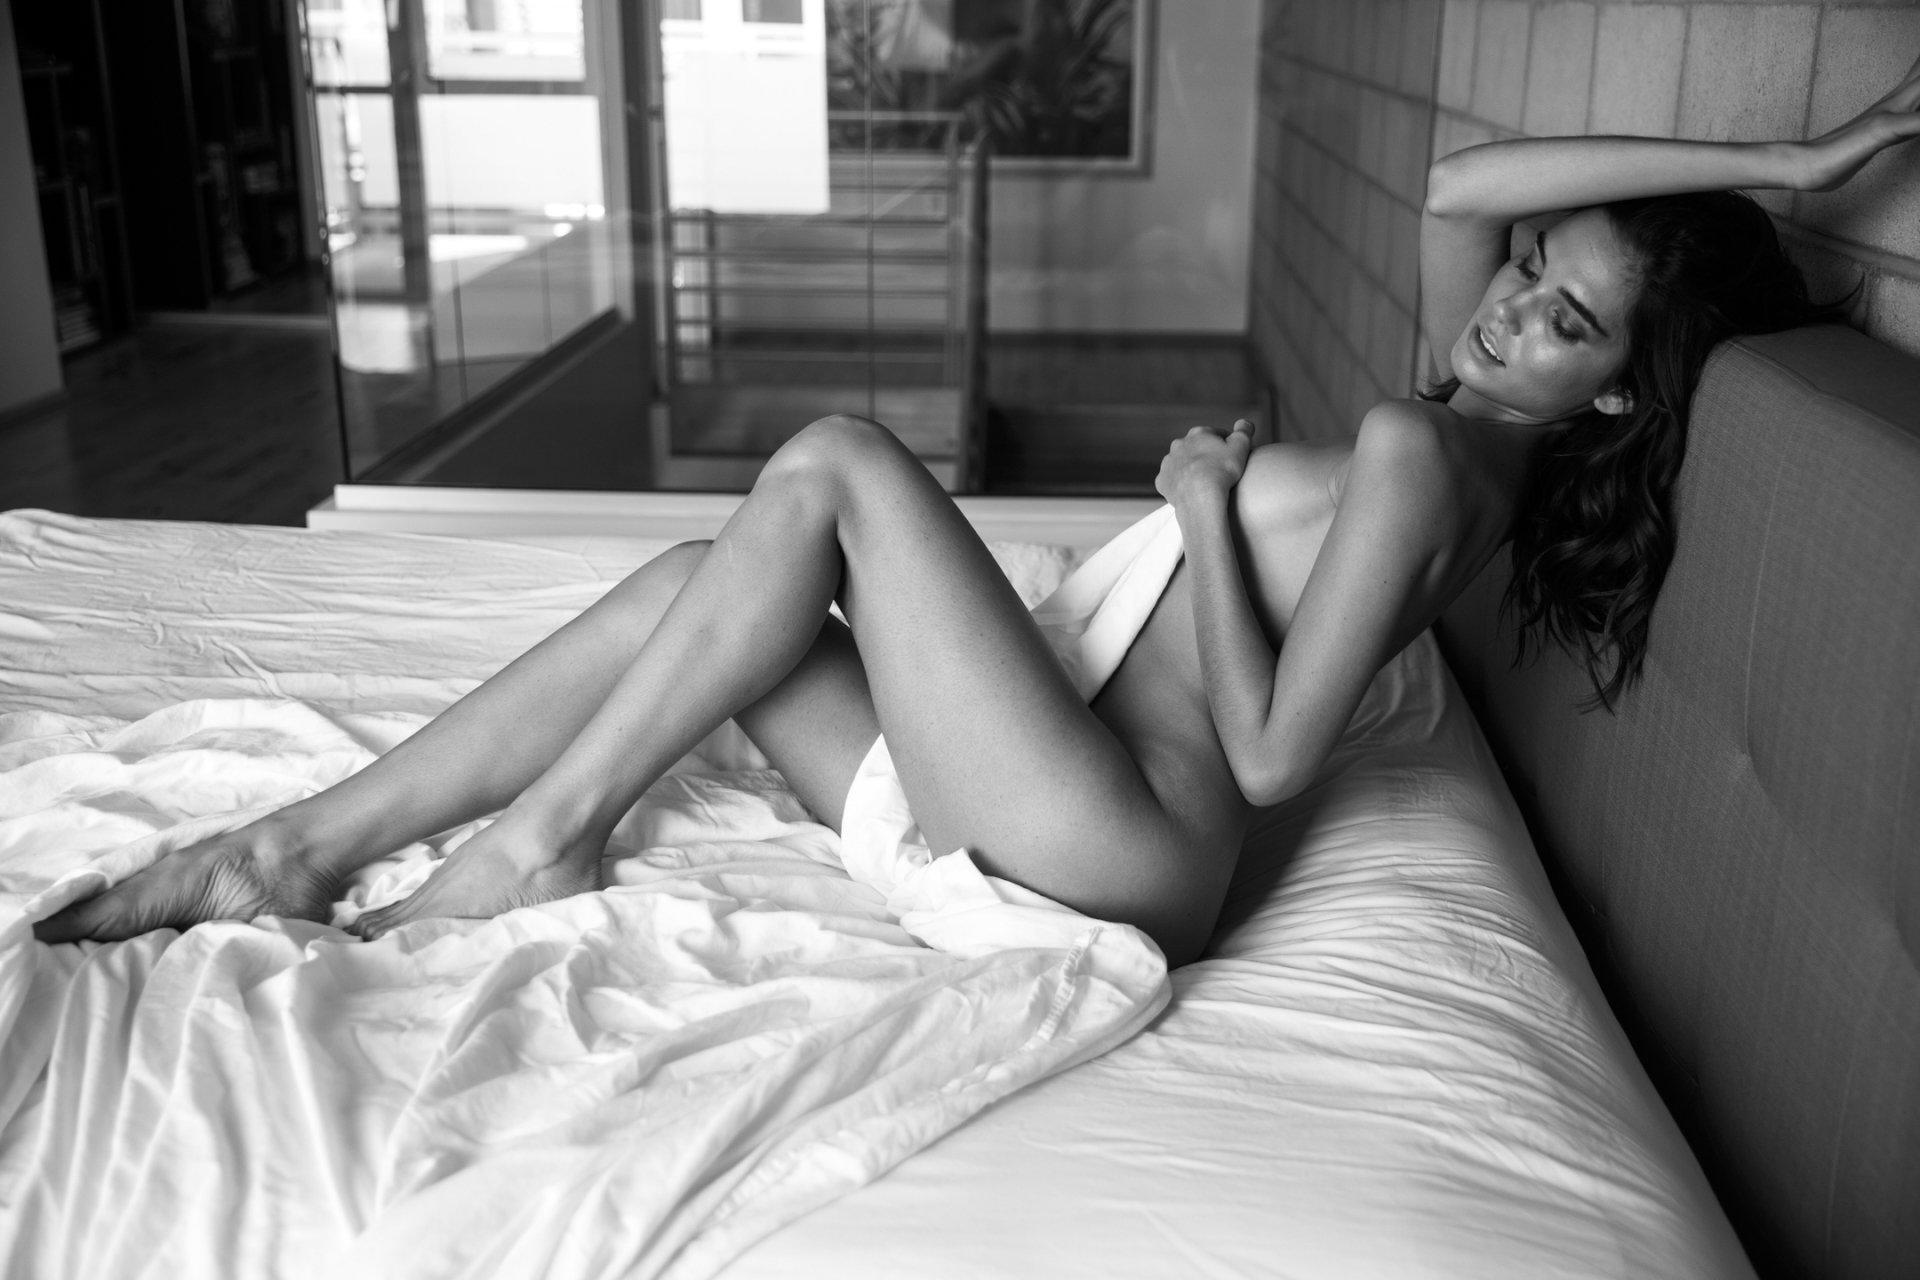 Kristina makarova sexy body in hot full frontal naked photoshoot